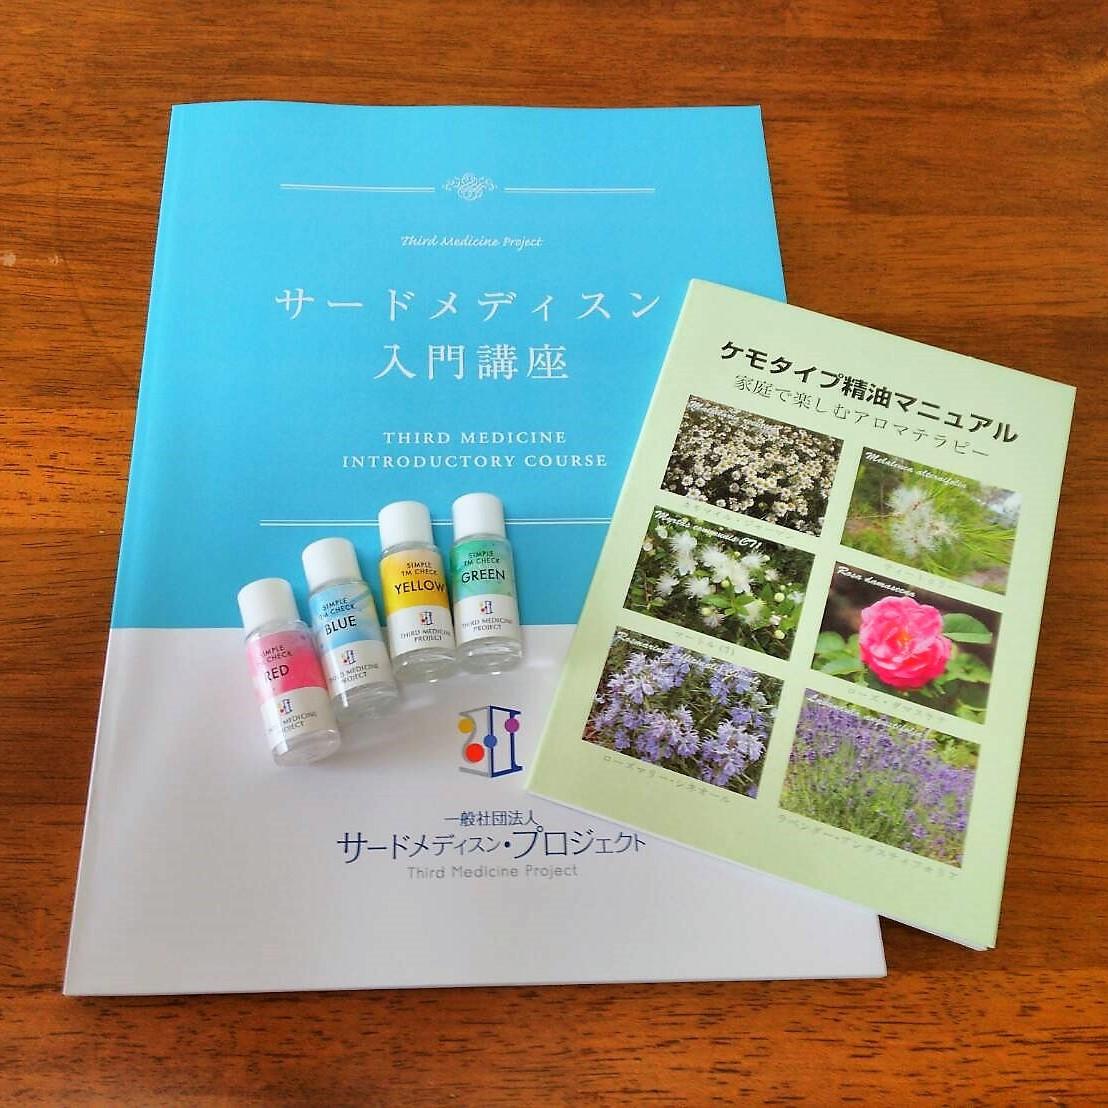 【11月~12月】コルテーヌ様主催 嗅覚反応分析士入門講座